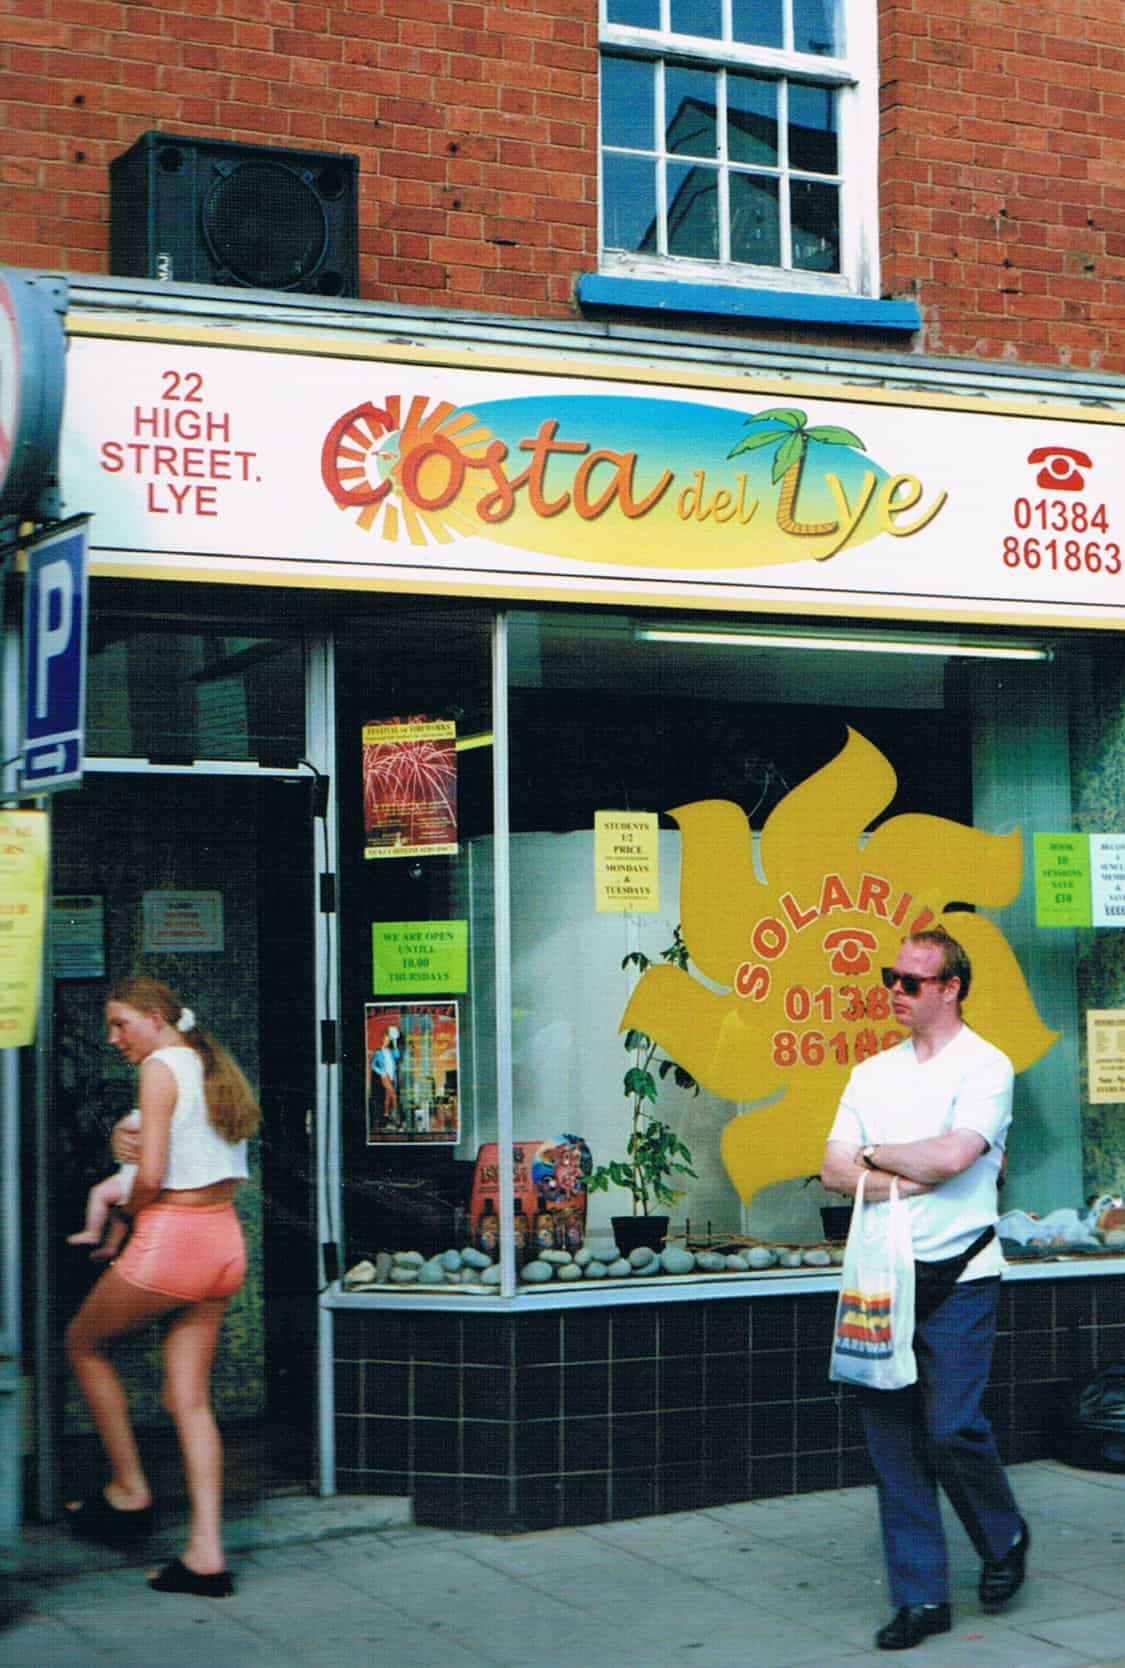 6. Costa del Lye 2000